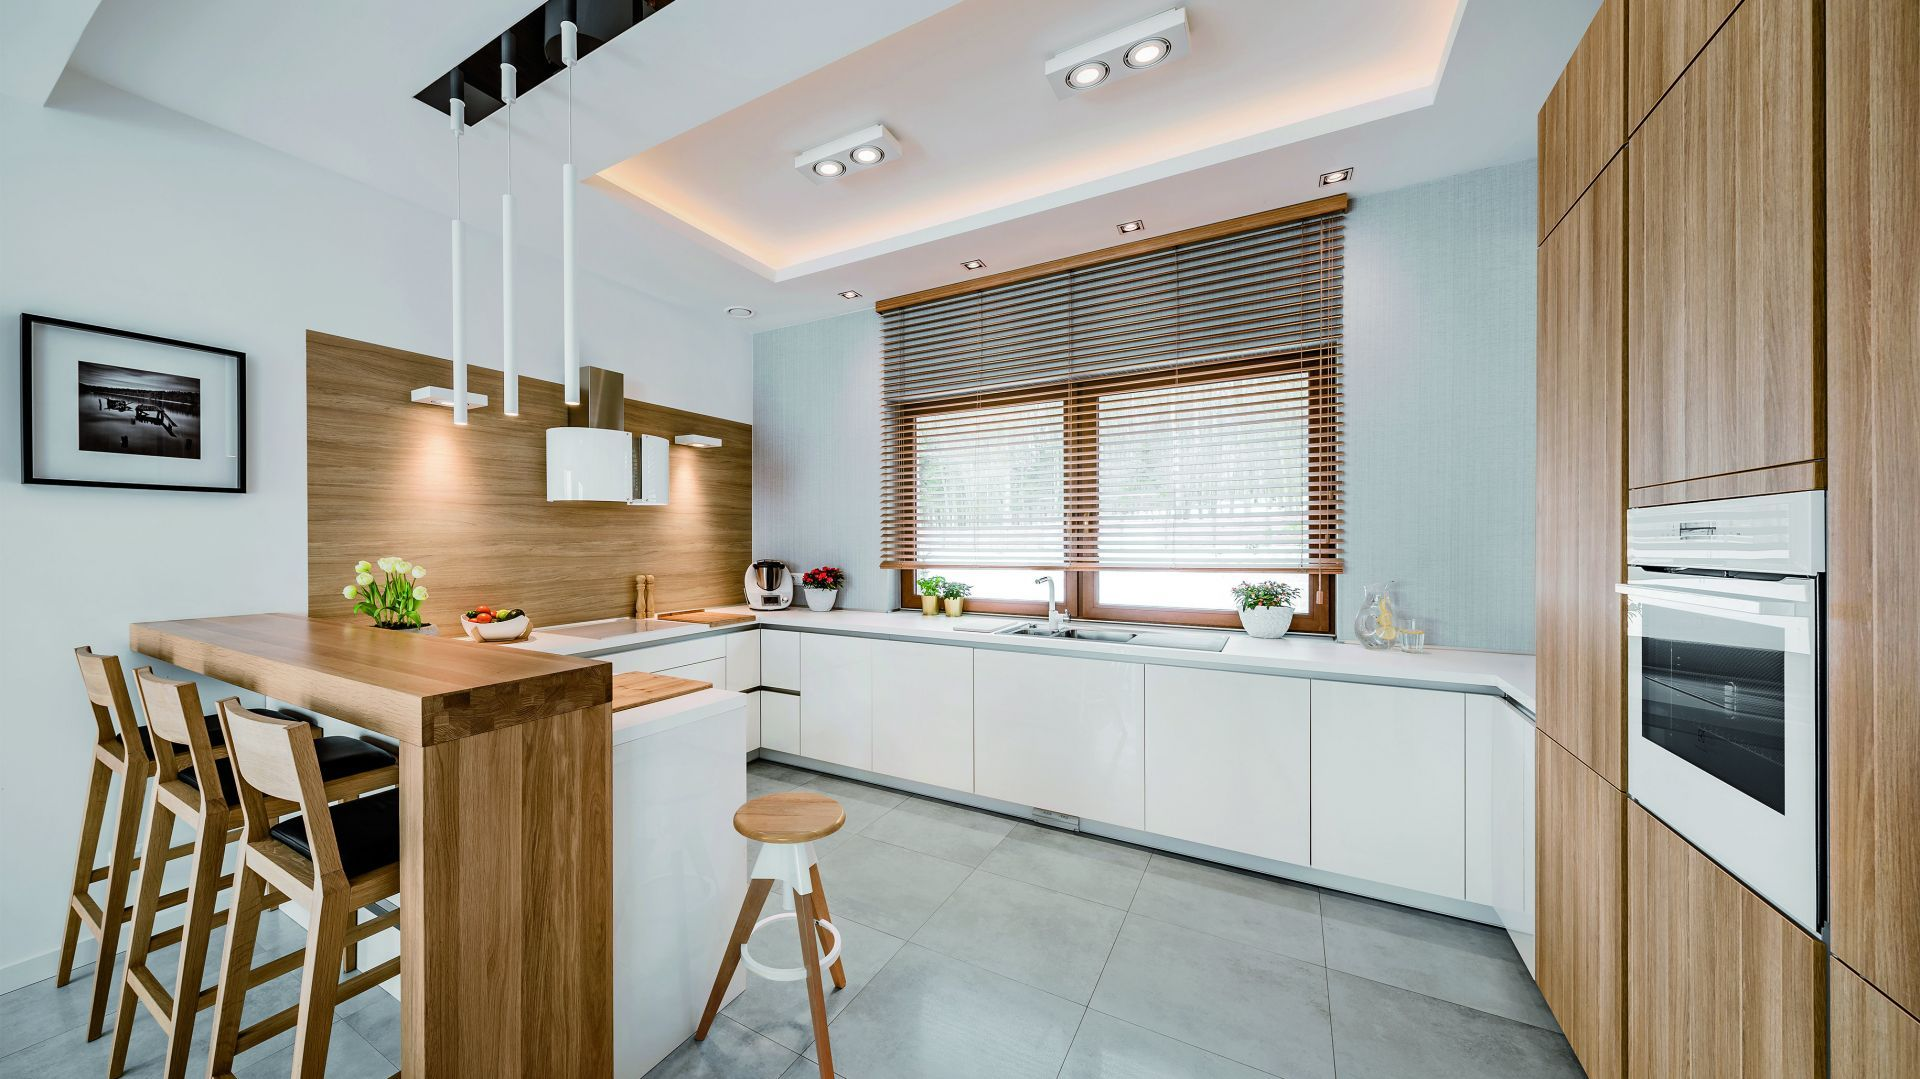 Okno W Kuchni Pomysly Na Aranzacje House Design Interior Home